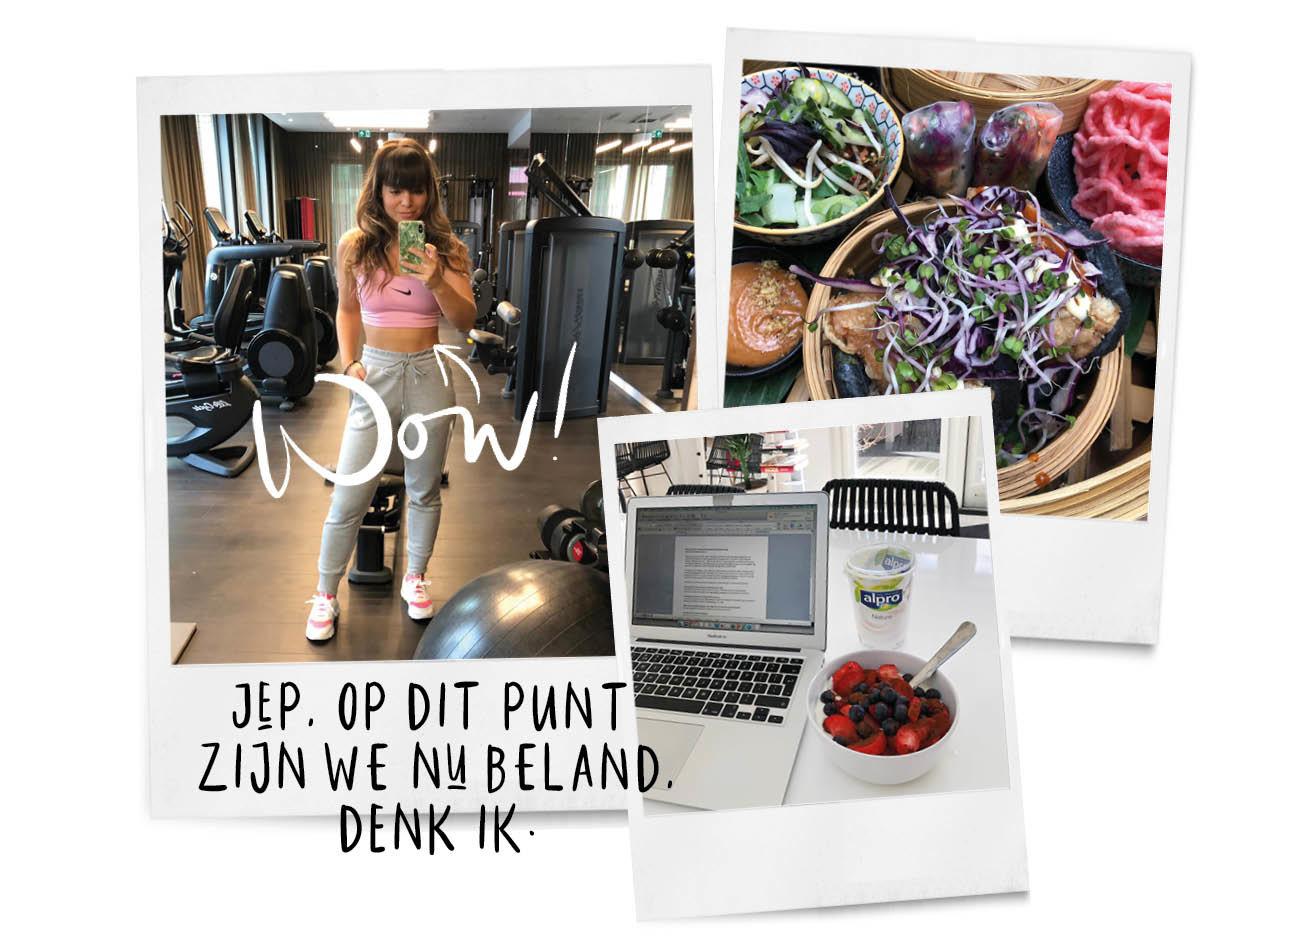 Kiki's dagboek in de sportschool en voeding